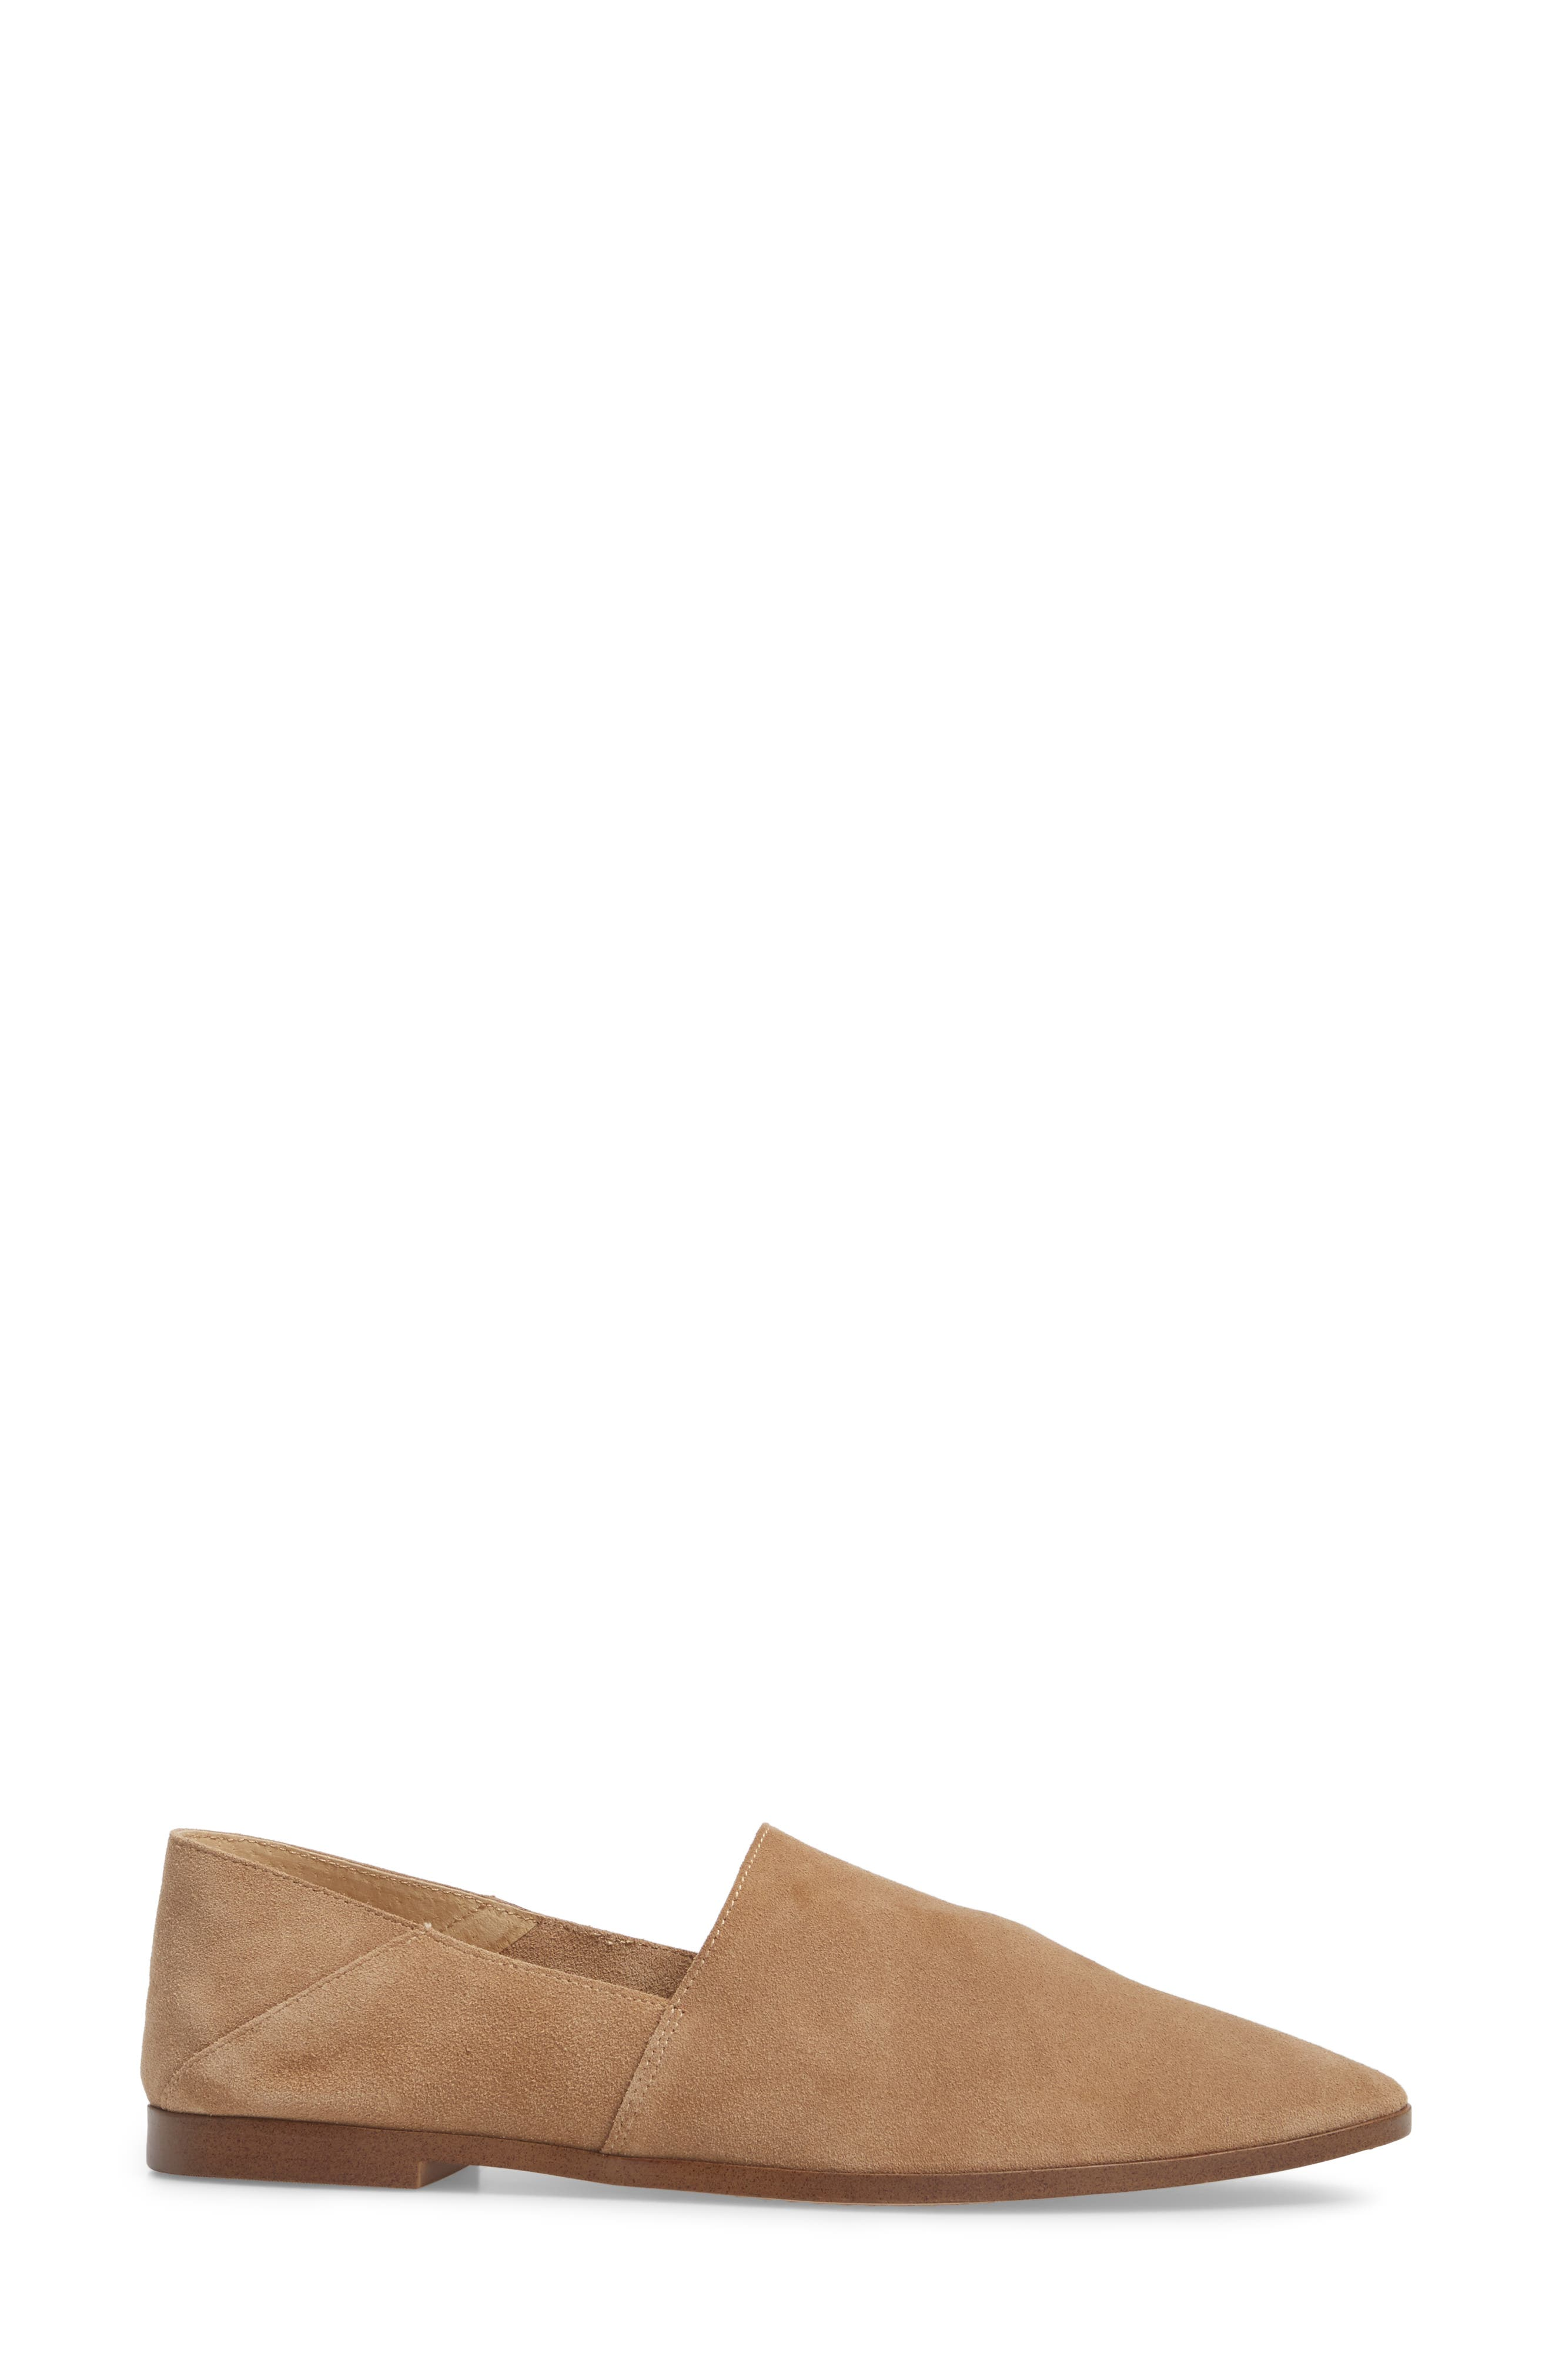 Babette Almond Toe Flat,                             Alternate thumbnail 3, color,                             Light Taupe Suede